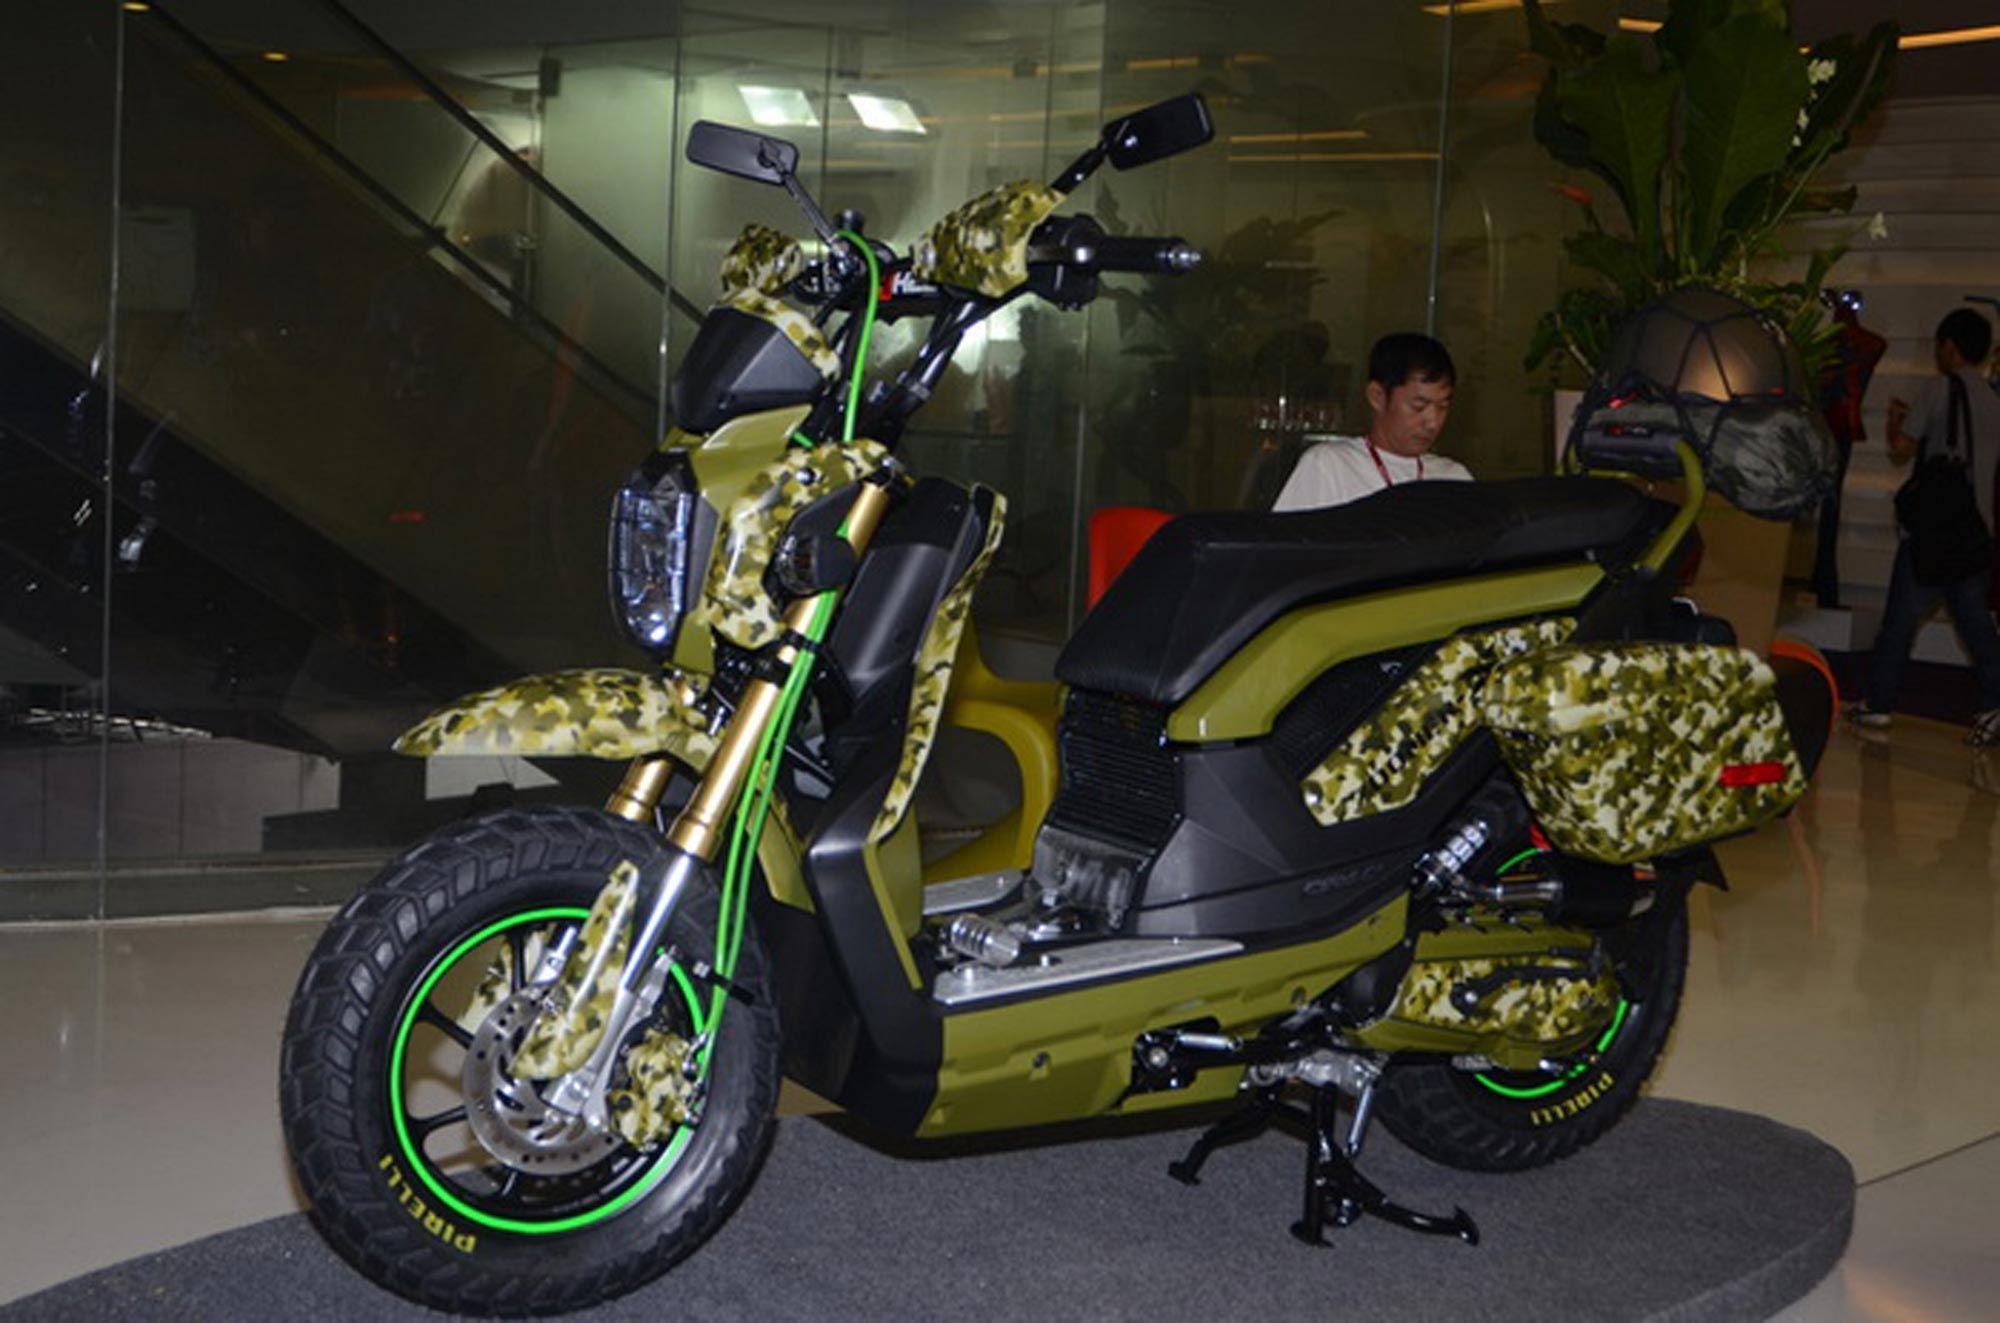 2013 Honda Zoomer X Green Modifications Motorcycles Pinterest All New Cb 150r Streetfire Stallion Black Kab Semarang